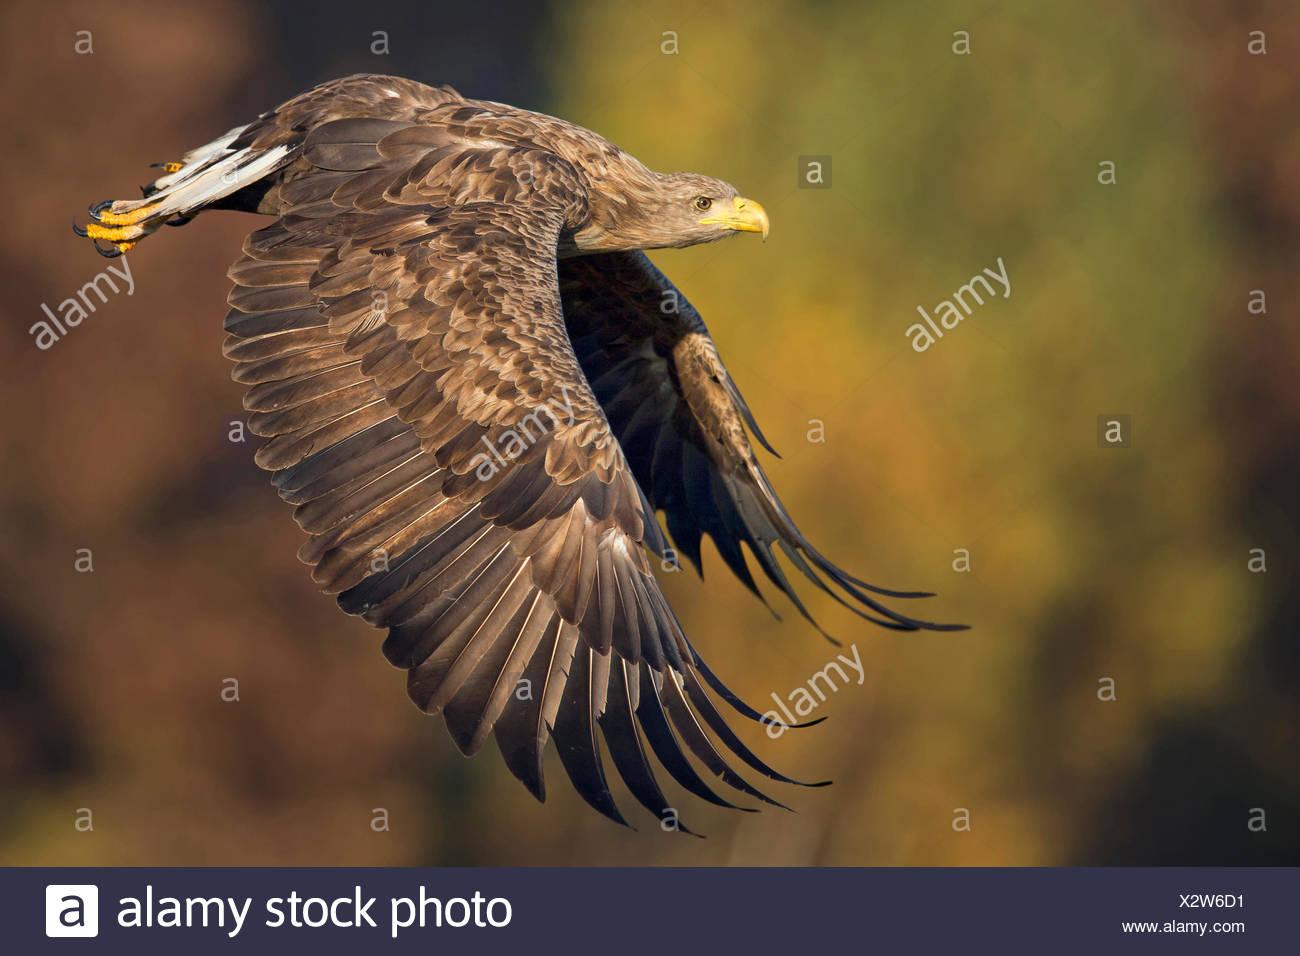 white-tailed sea eagle (Haliaeetus albicilla), adult flying, Poland, Plock Stock Photo